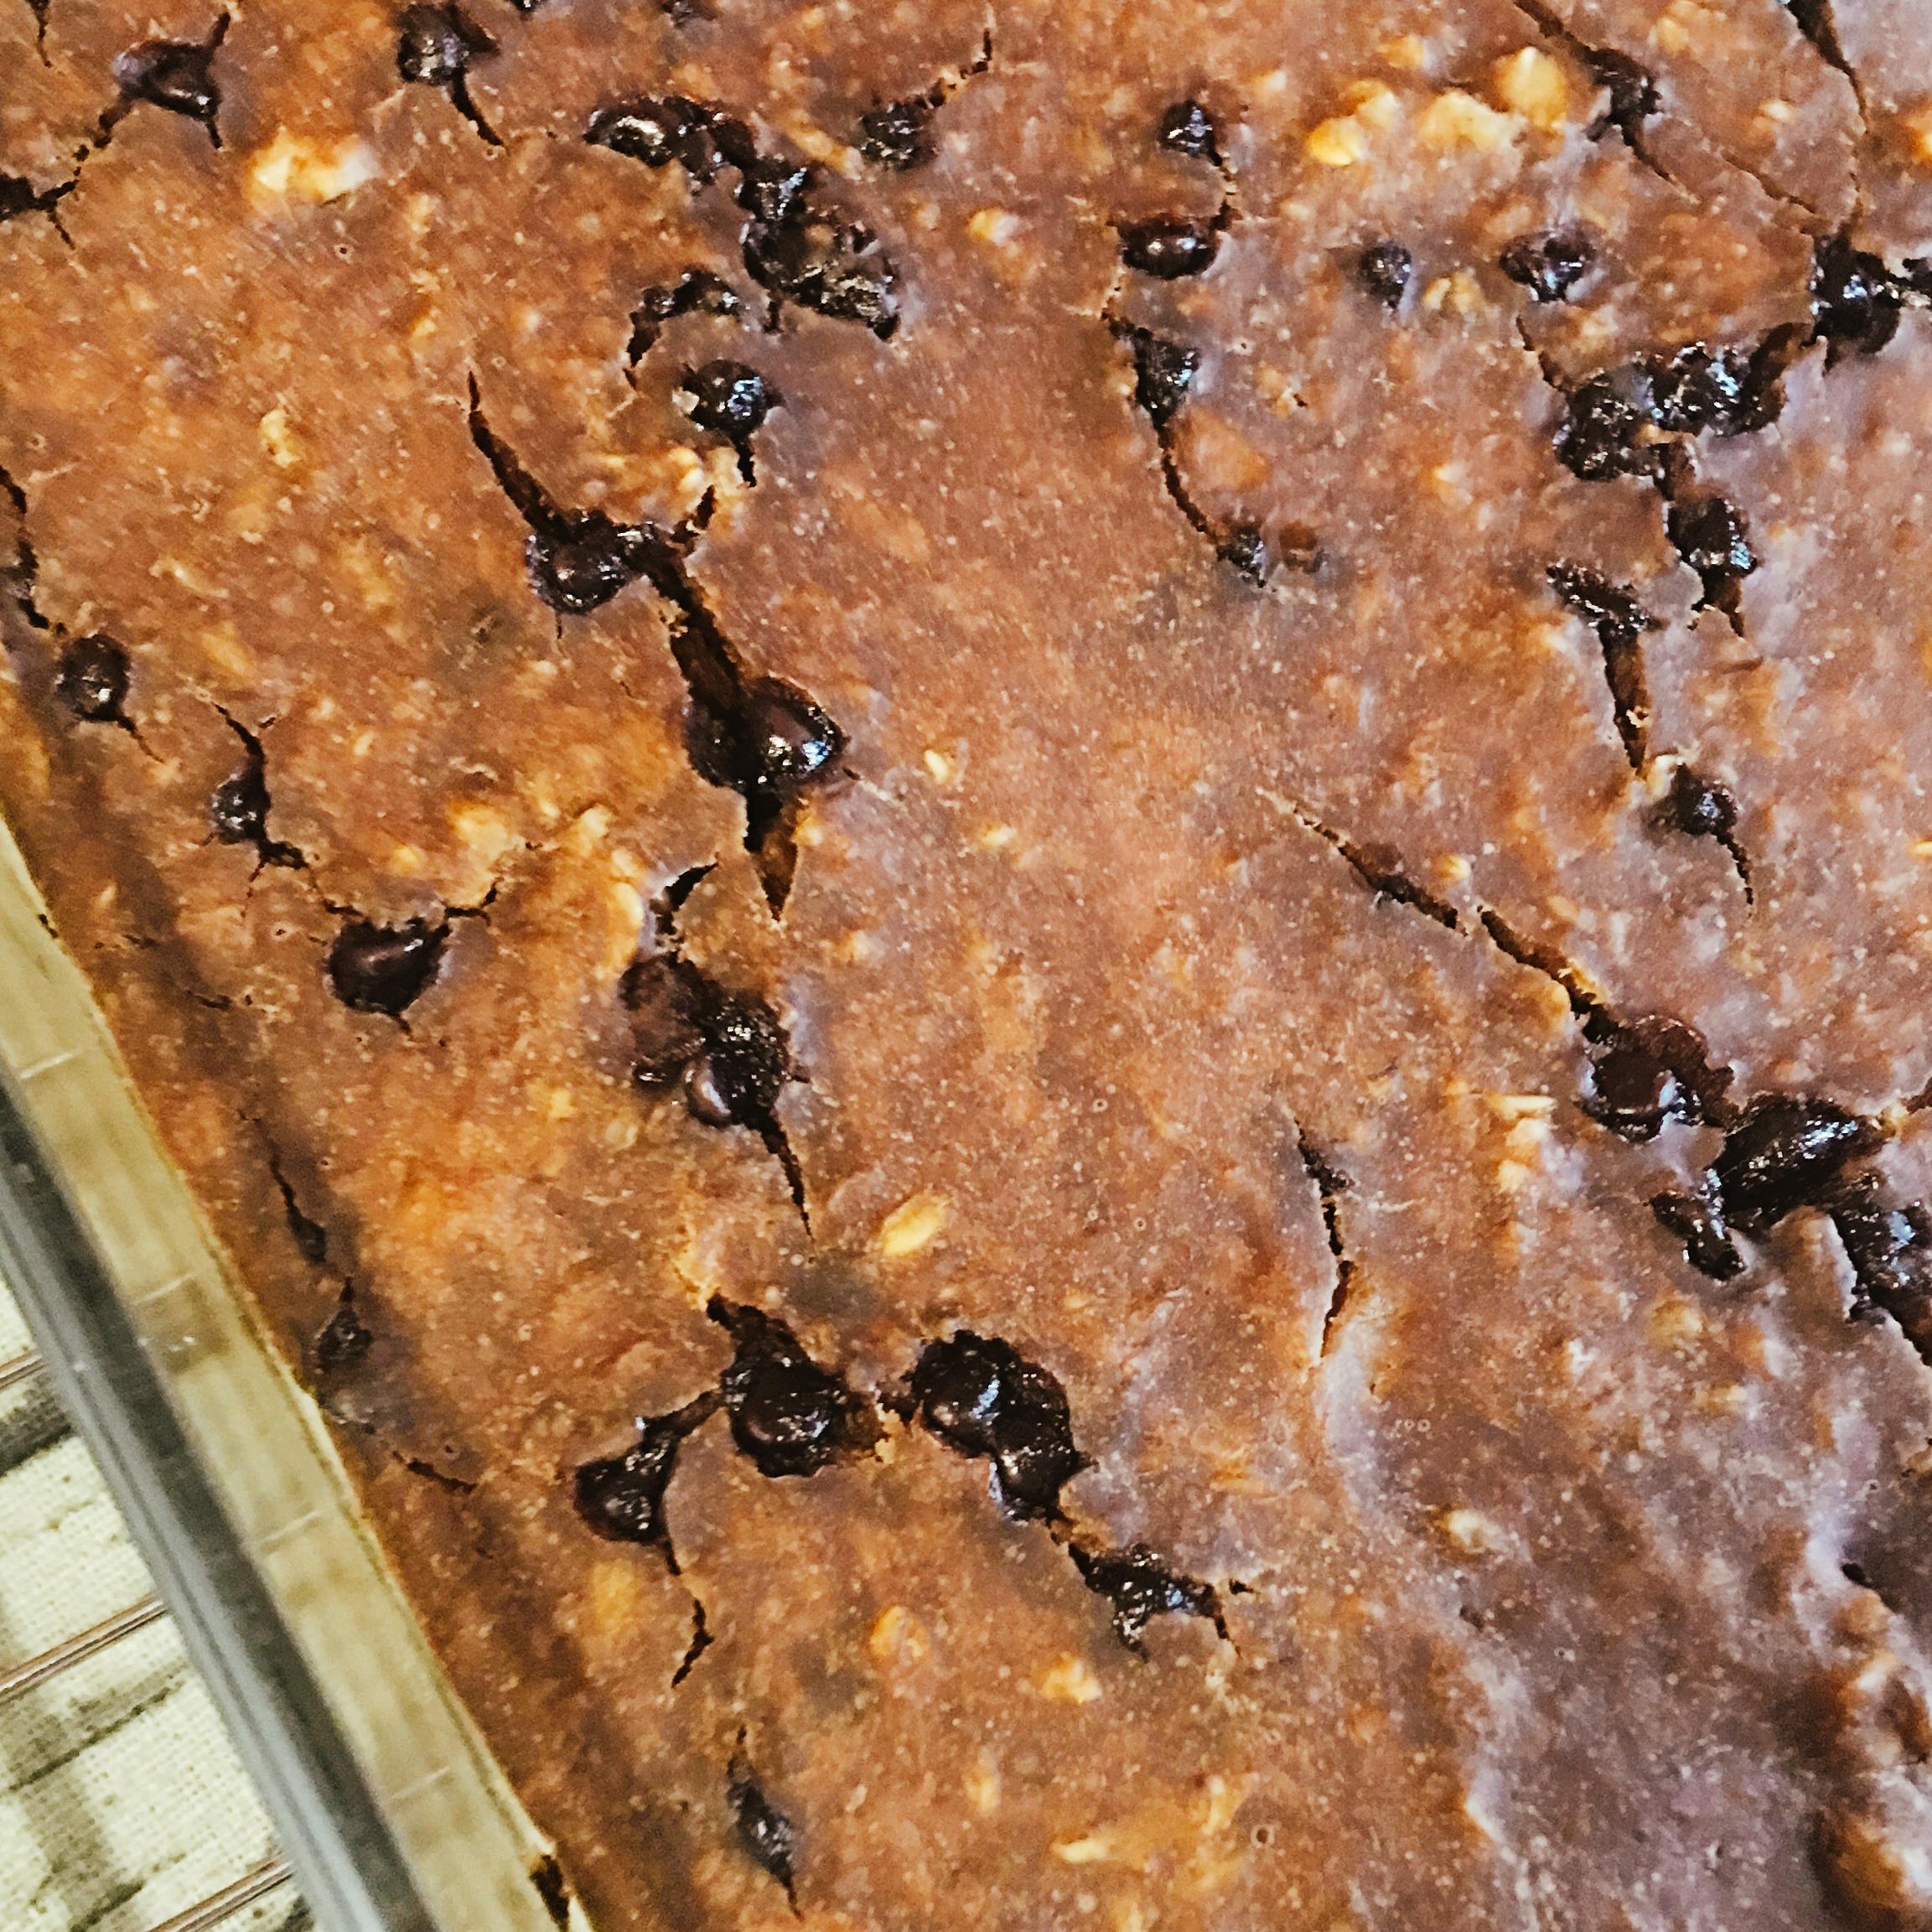 Chocolate Chip Oatmeal Cake